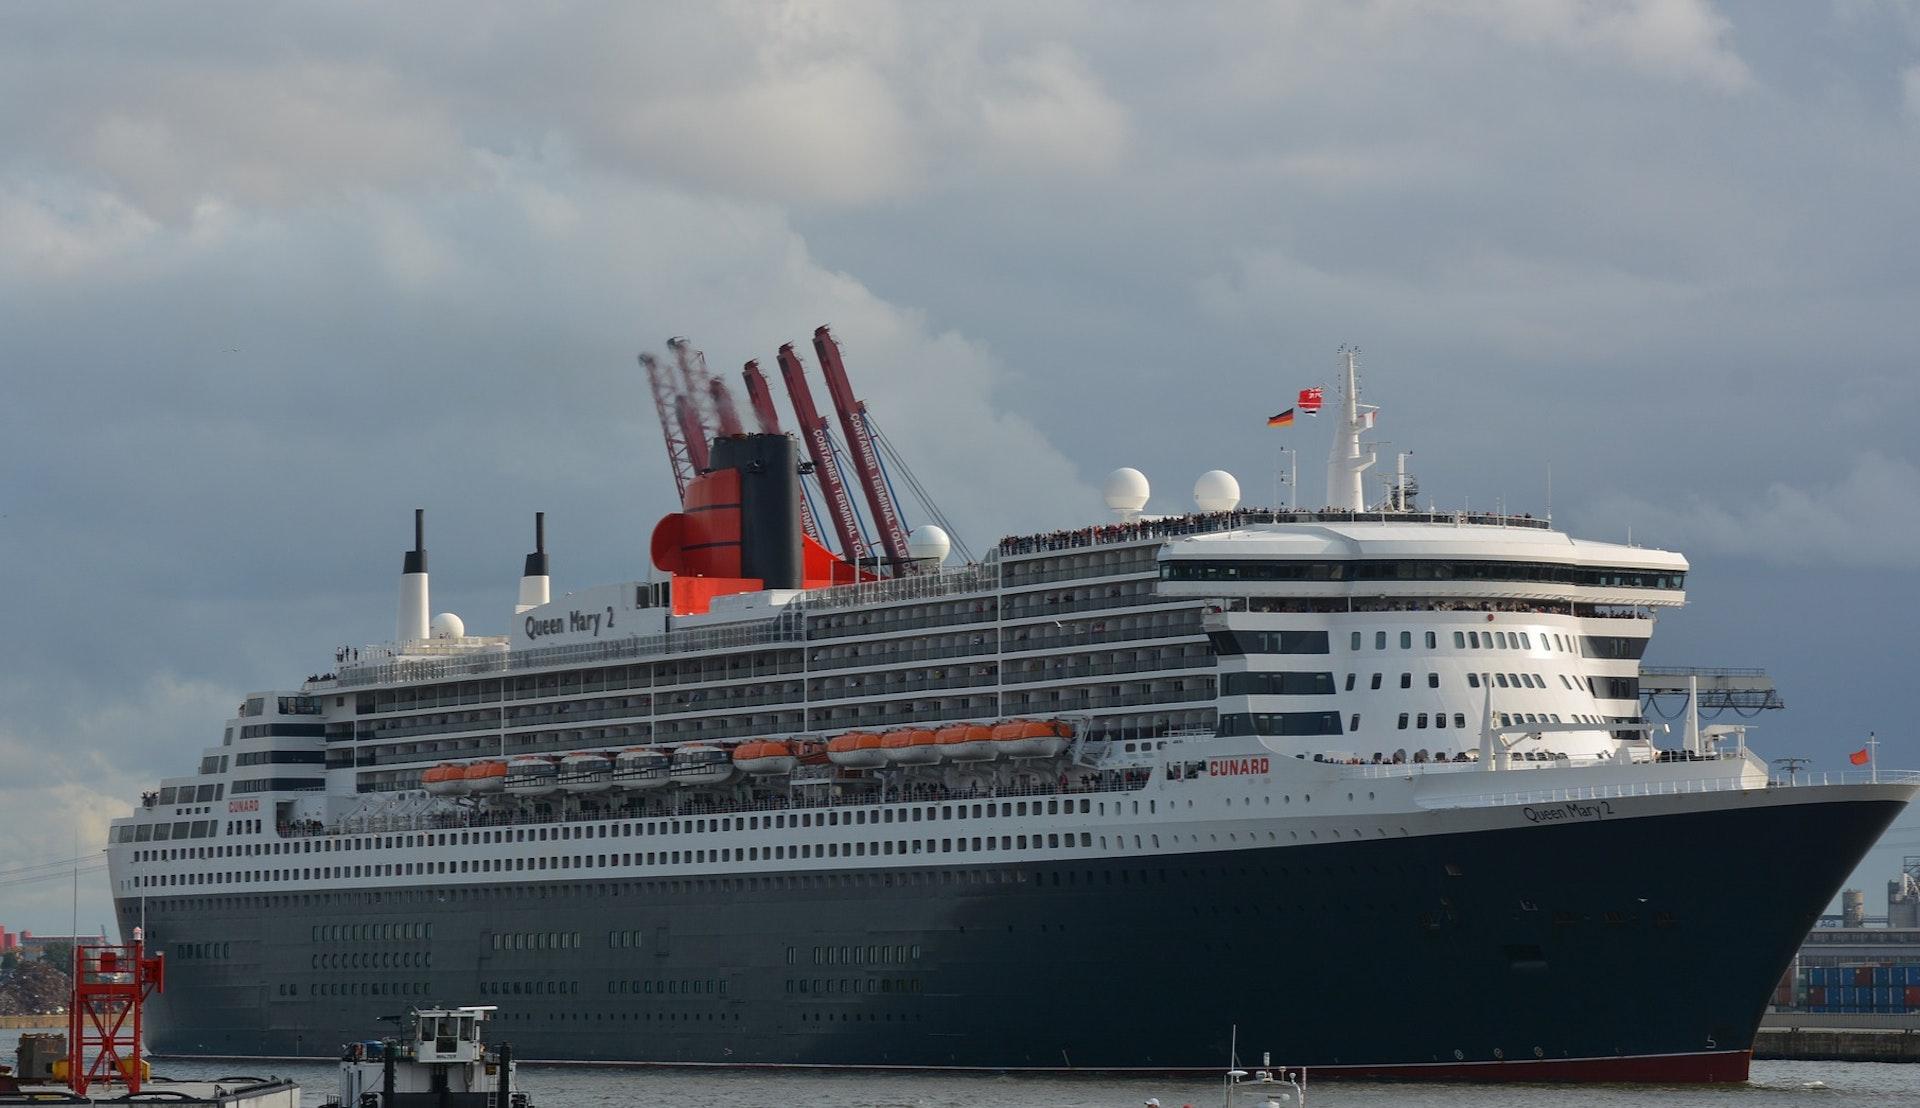 Queen Mary 2 til anker i Hamburg © fsHH, Pixabay